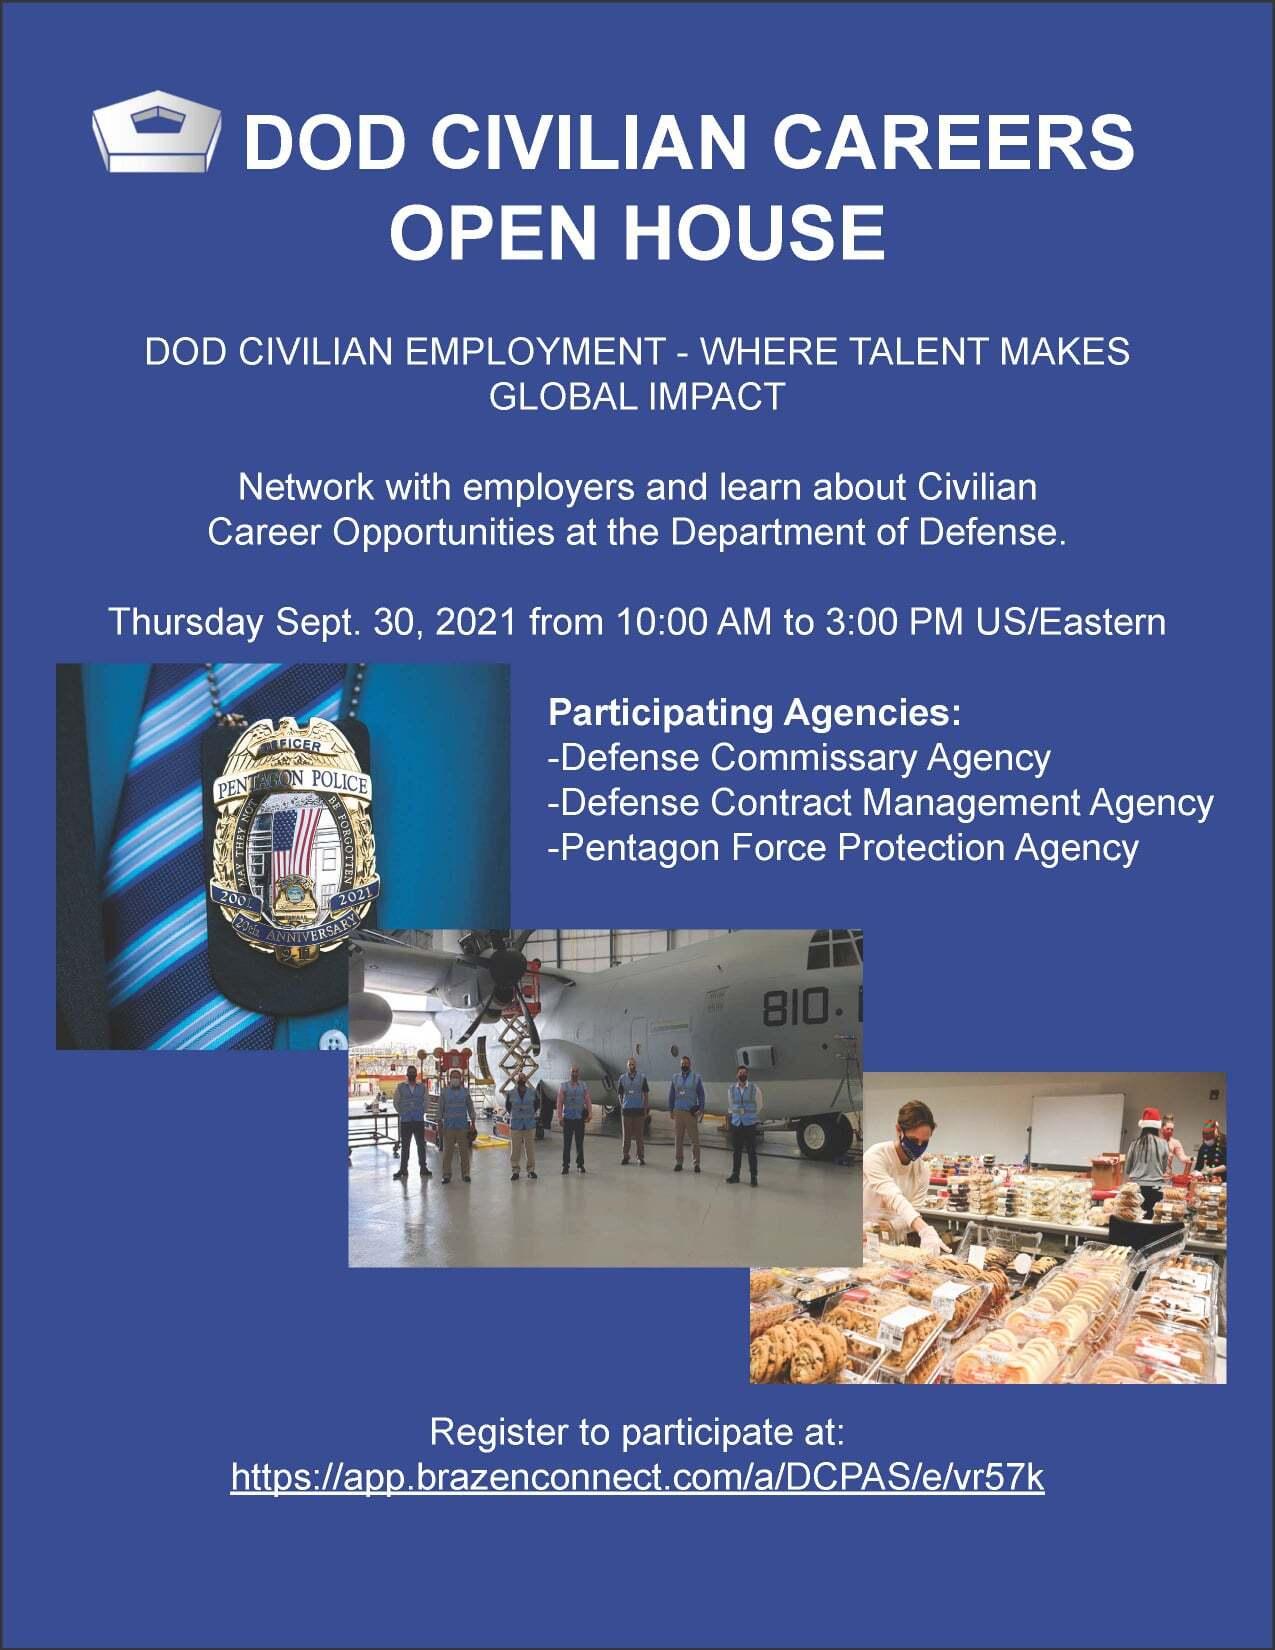 DOD Civilian Careers Open House